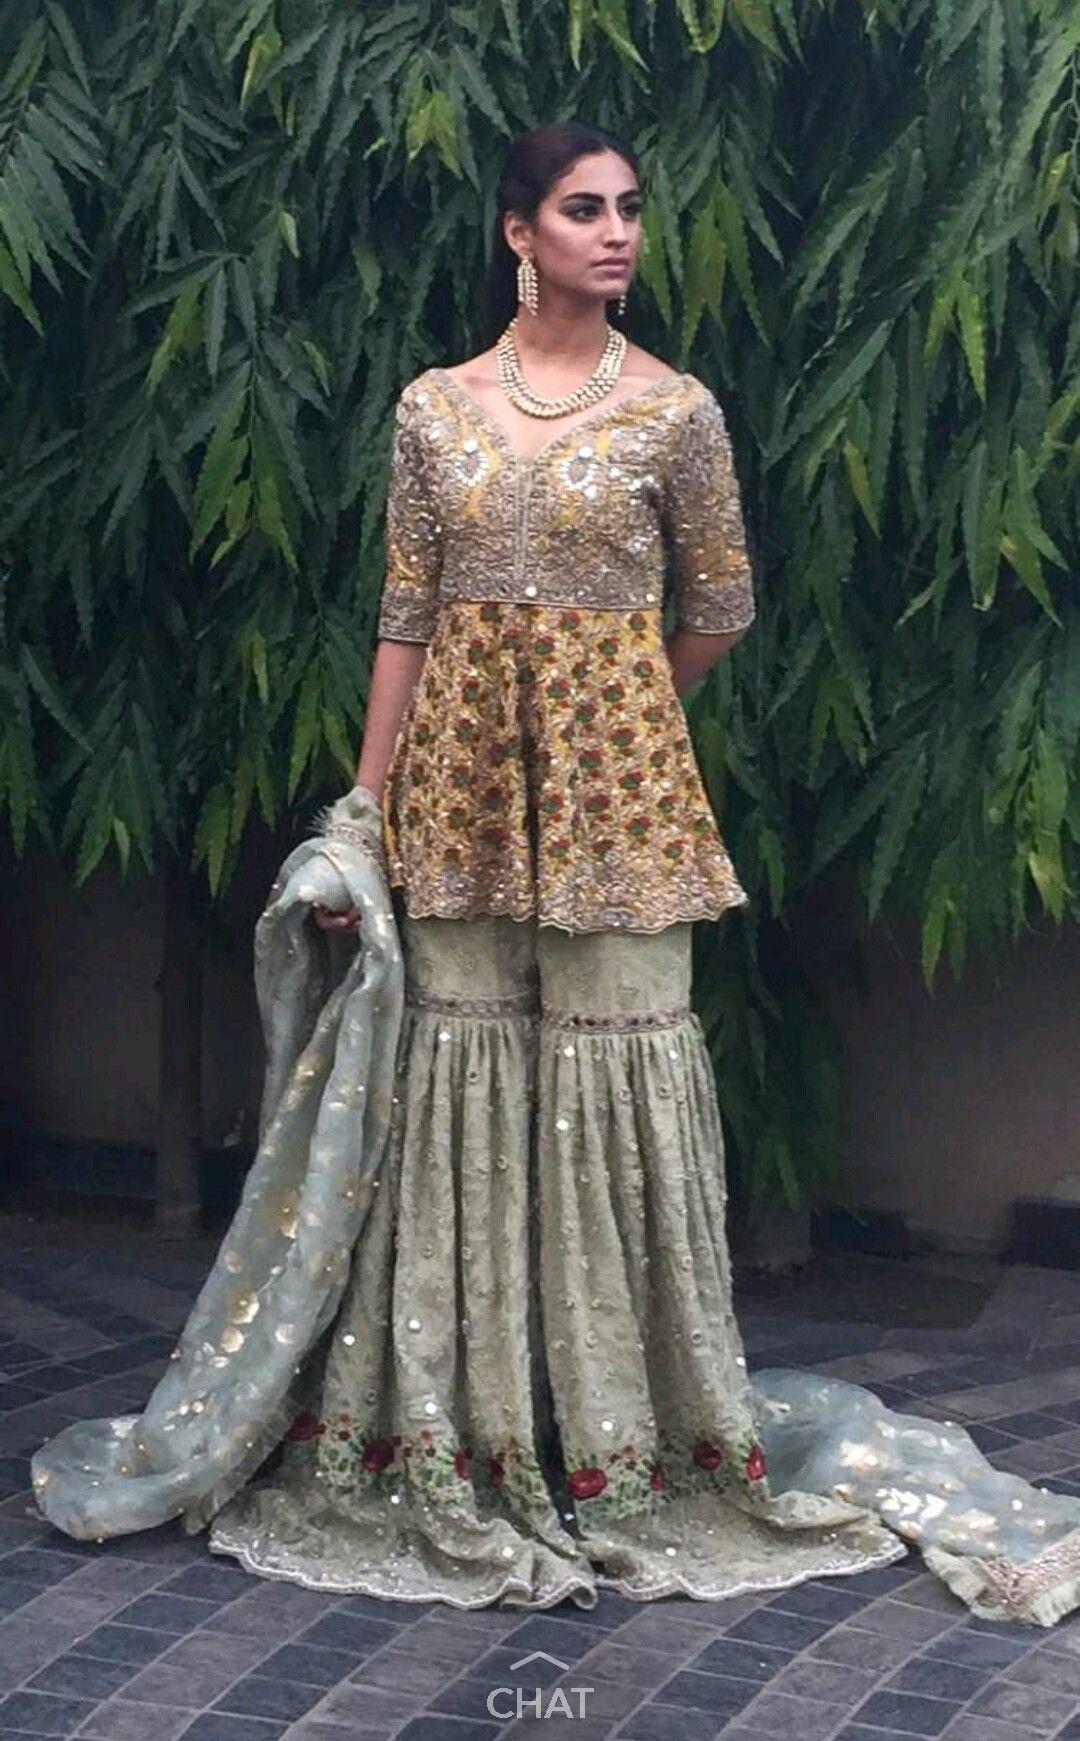 Pin von Komal Chhatwani auf Gorgeous indian outfits !! | Pinterest